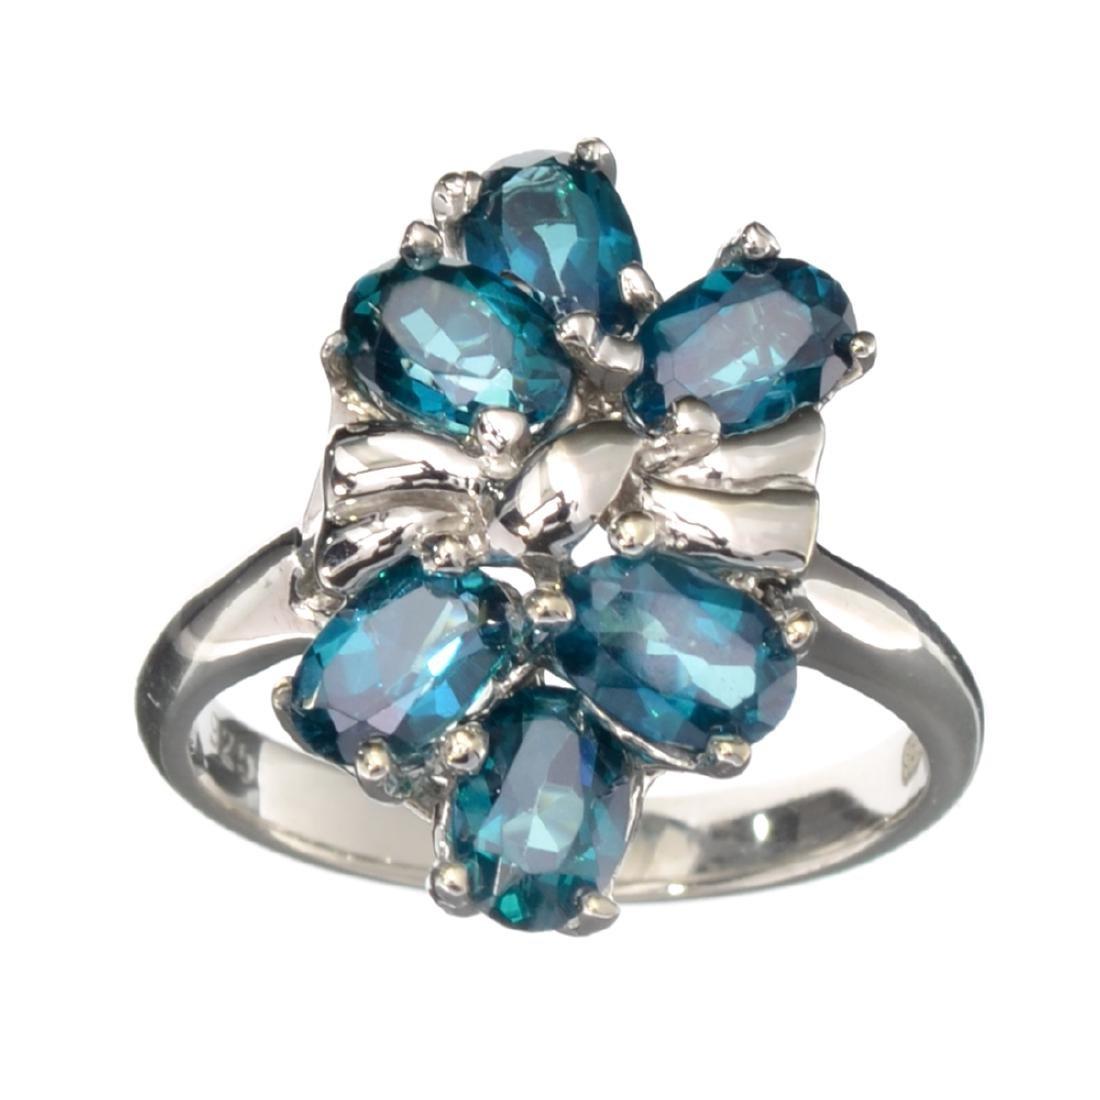 Fine Jewelry Designer Sebastian 2.76CT Oval Cut Blue